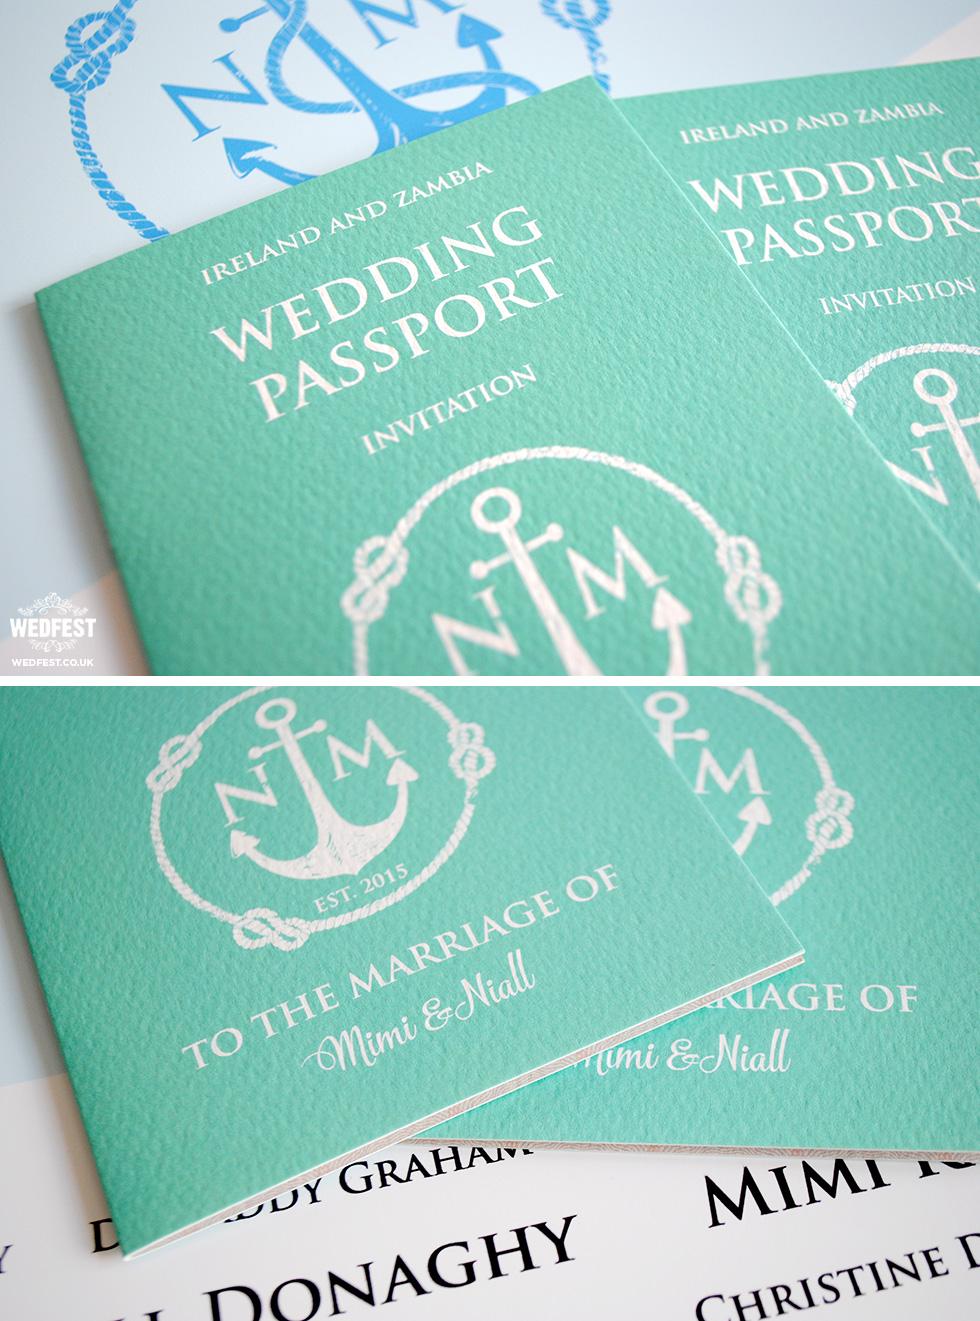 passport themed wedding invitation